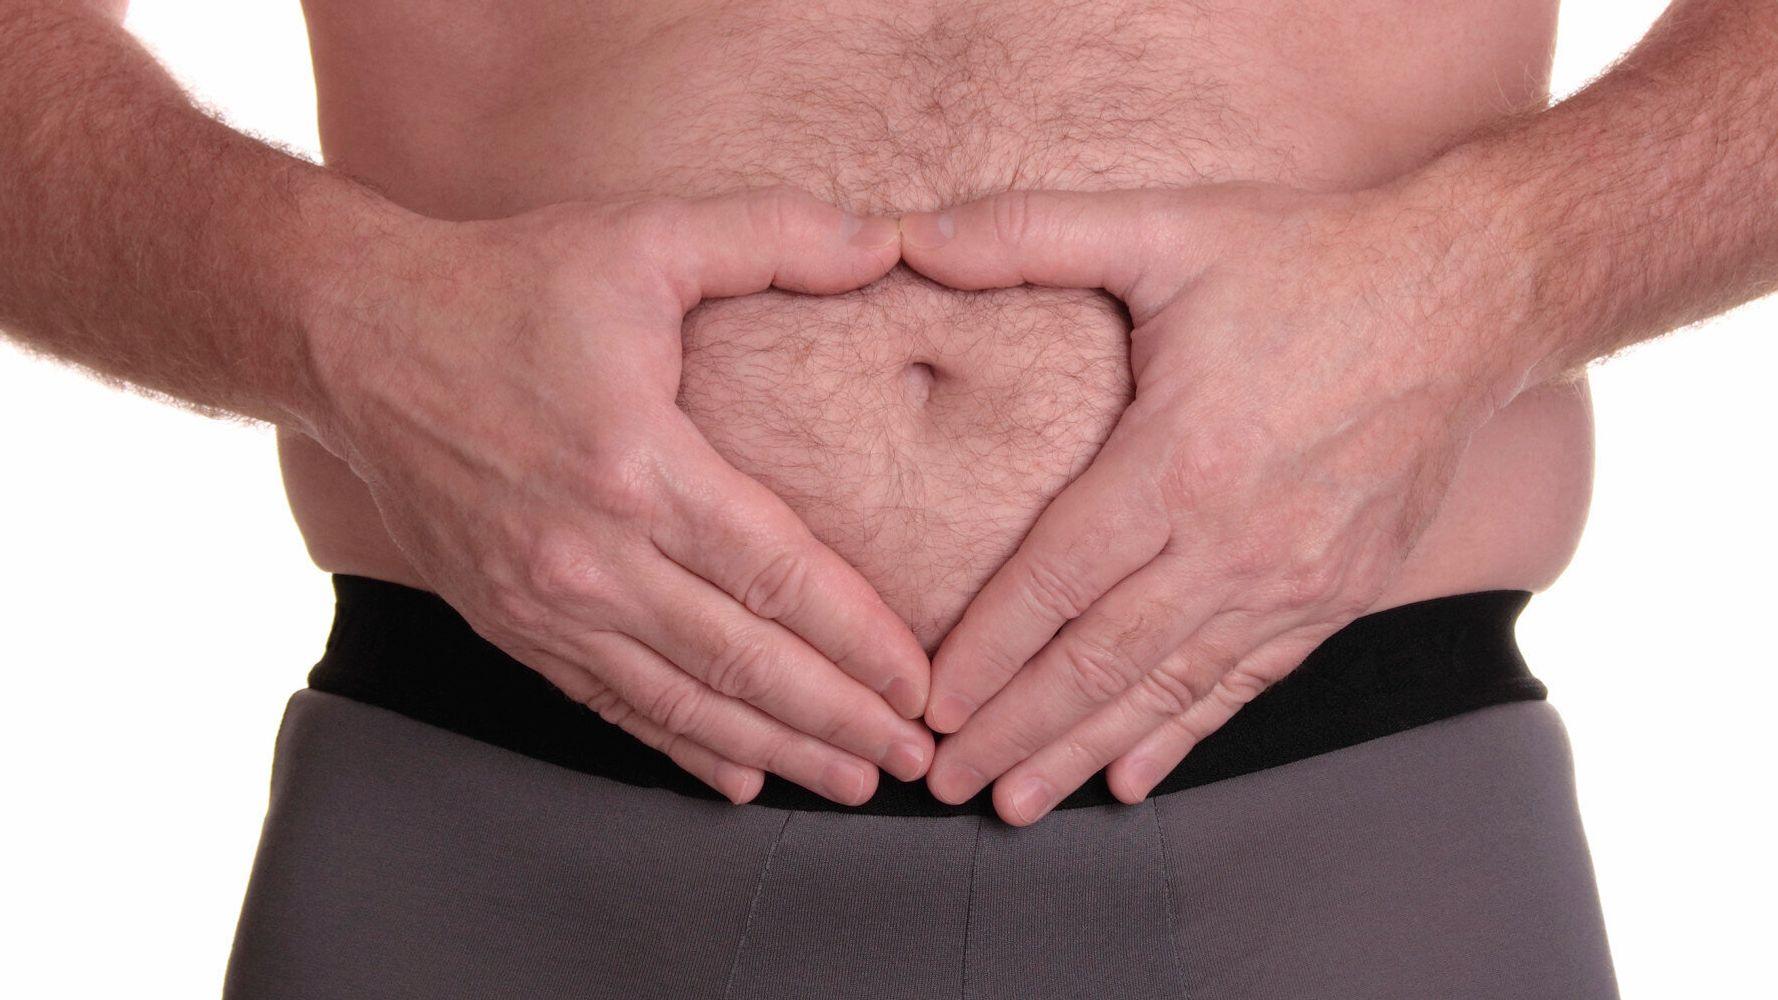 Penis fat guy Does Penis